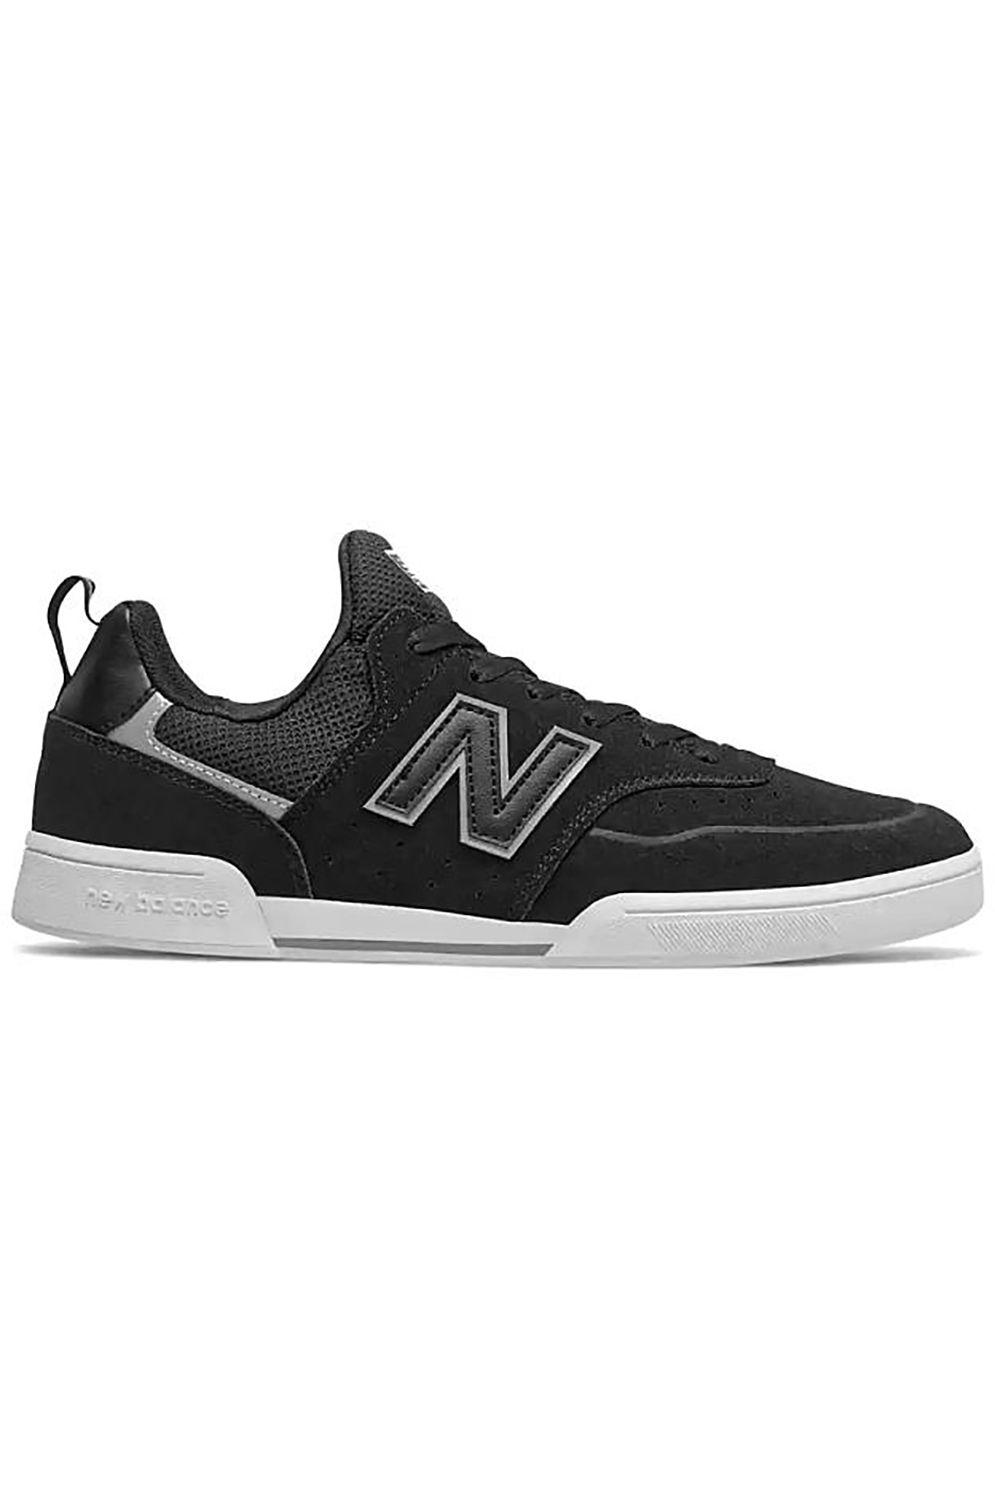 New Balance Shoes NM288S V1 JACK CURTIN Black/White